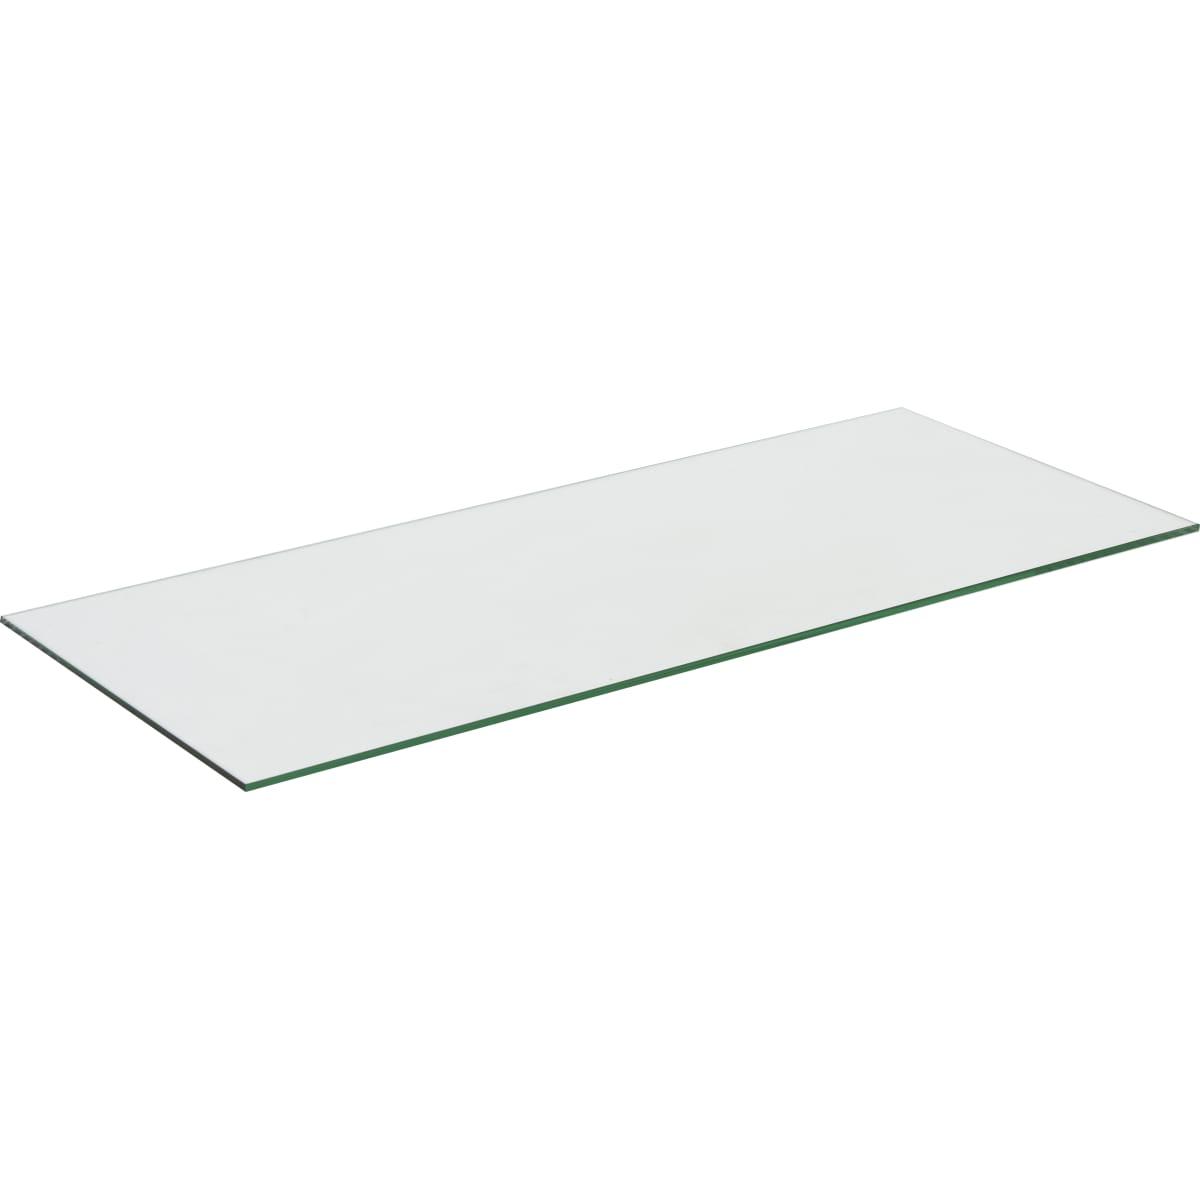 Полка 75.8x0.6x32, стекло, цвет прозрачный